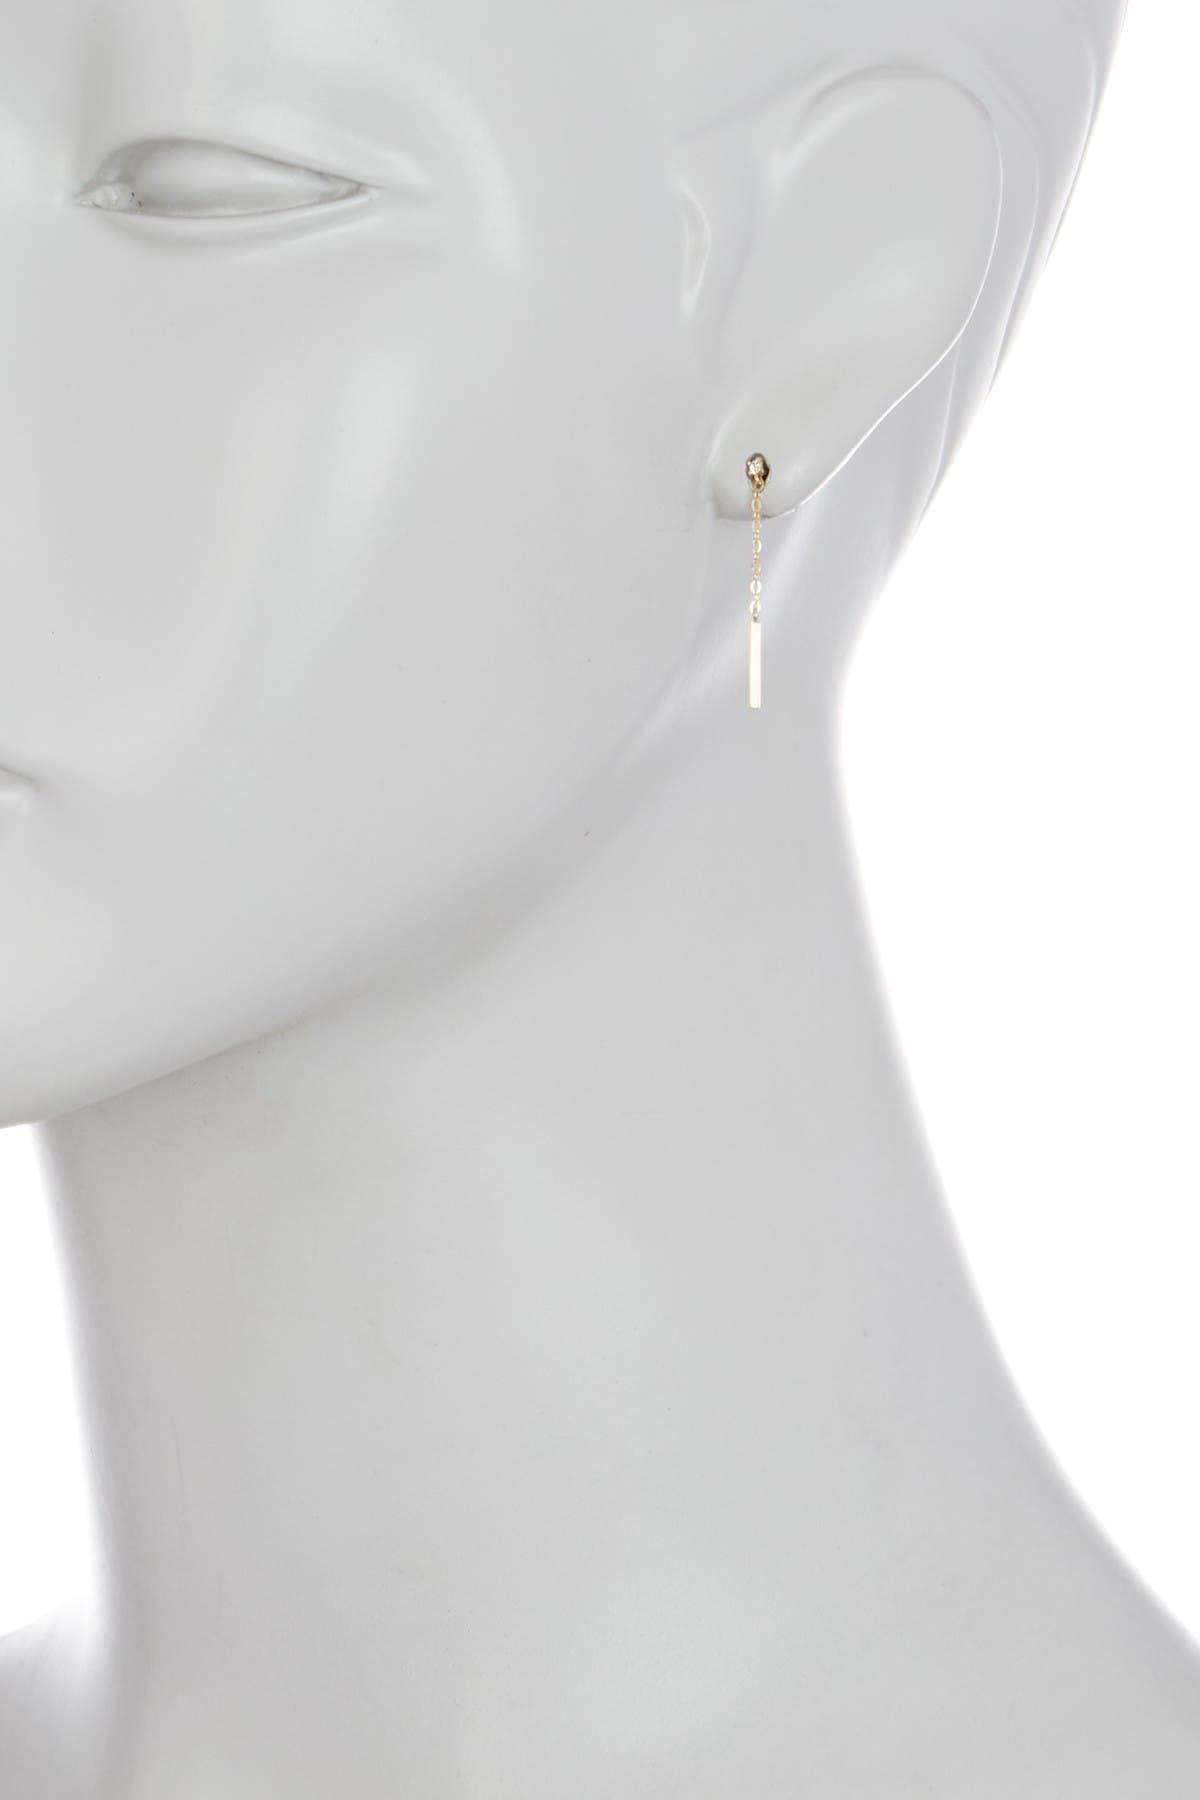 Image of Candela 14K Yellow Gold Bar & Chain Drop Earrings